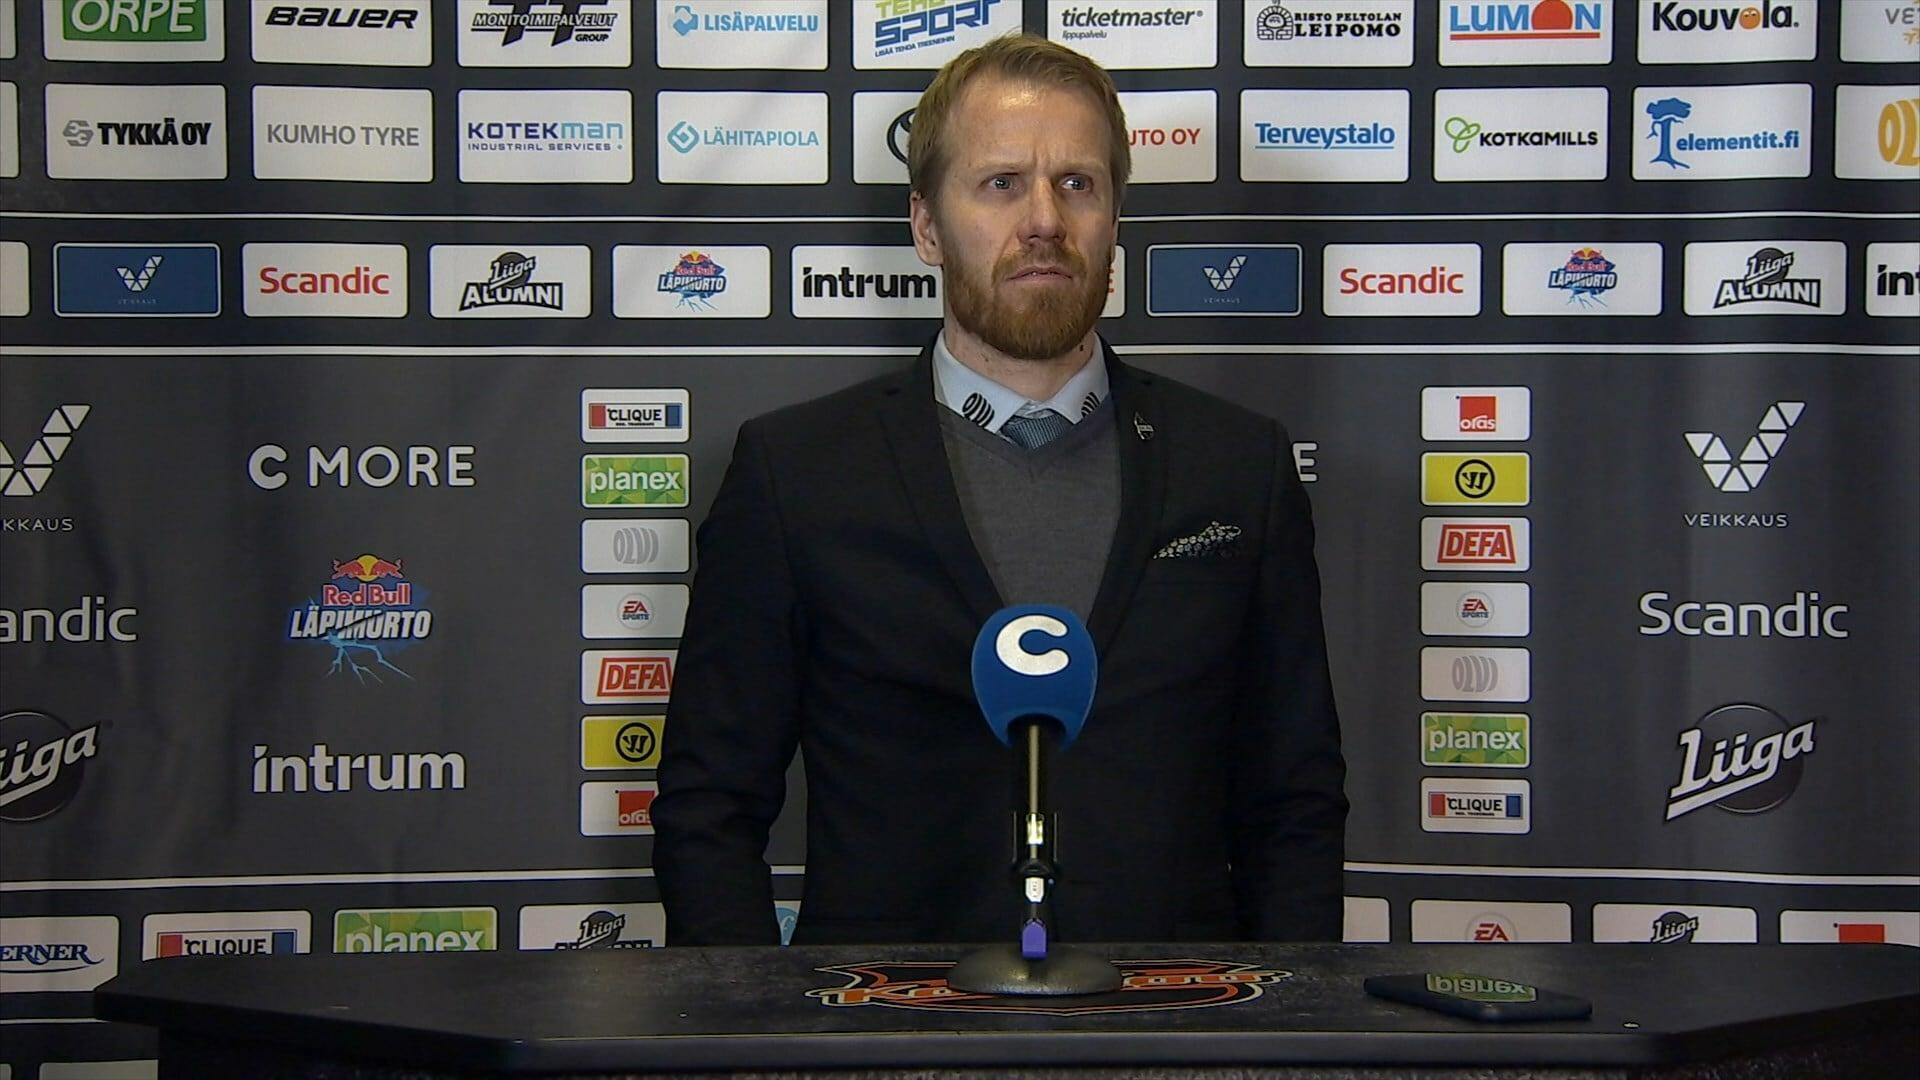 Liiga - Lehdistötilaisuus: KooKoo - KalPa